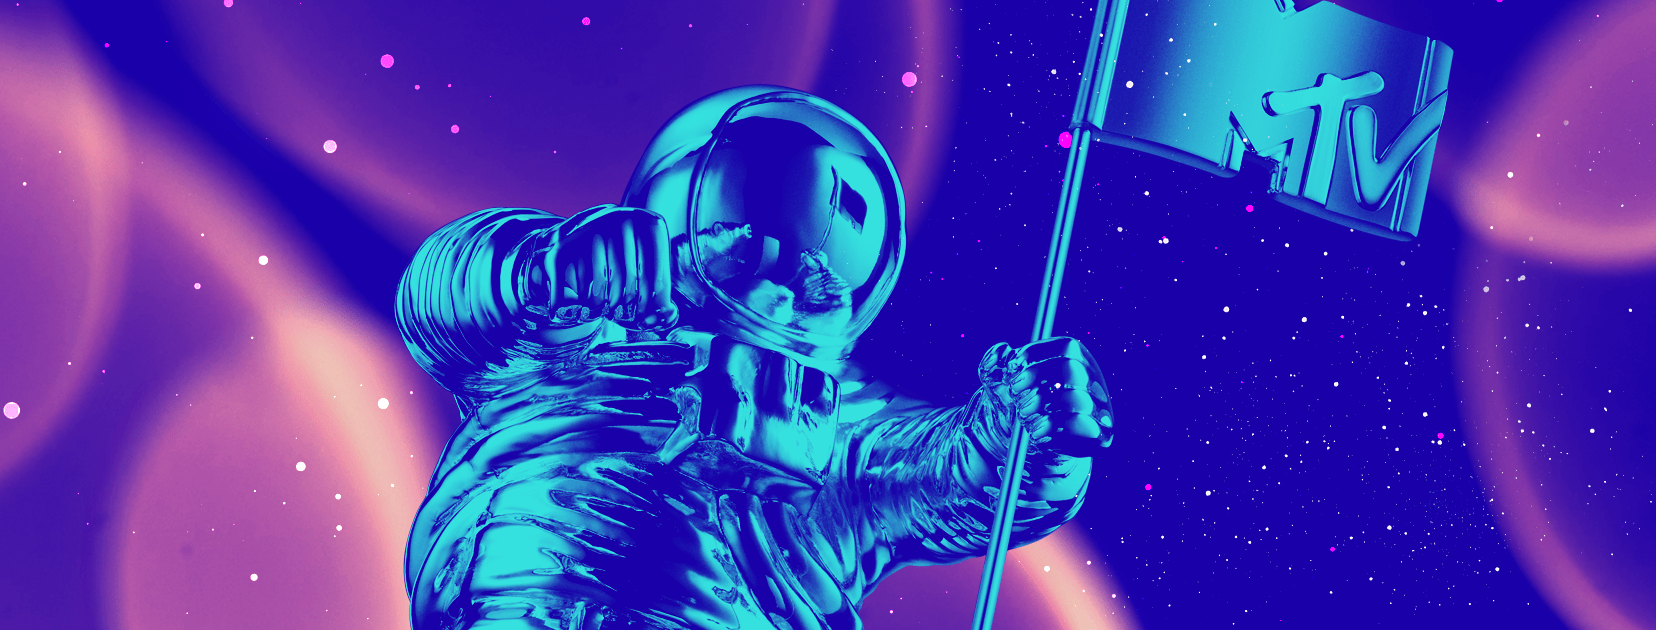 MTV VMAs 2017 - moon man logo